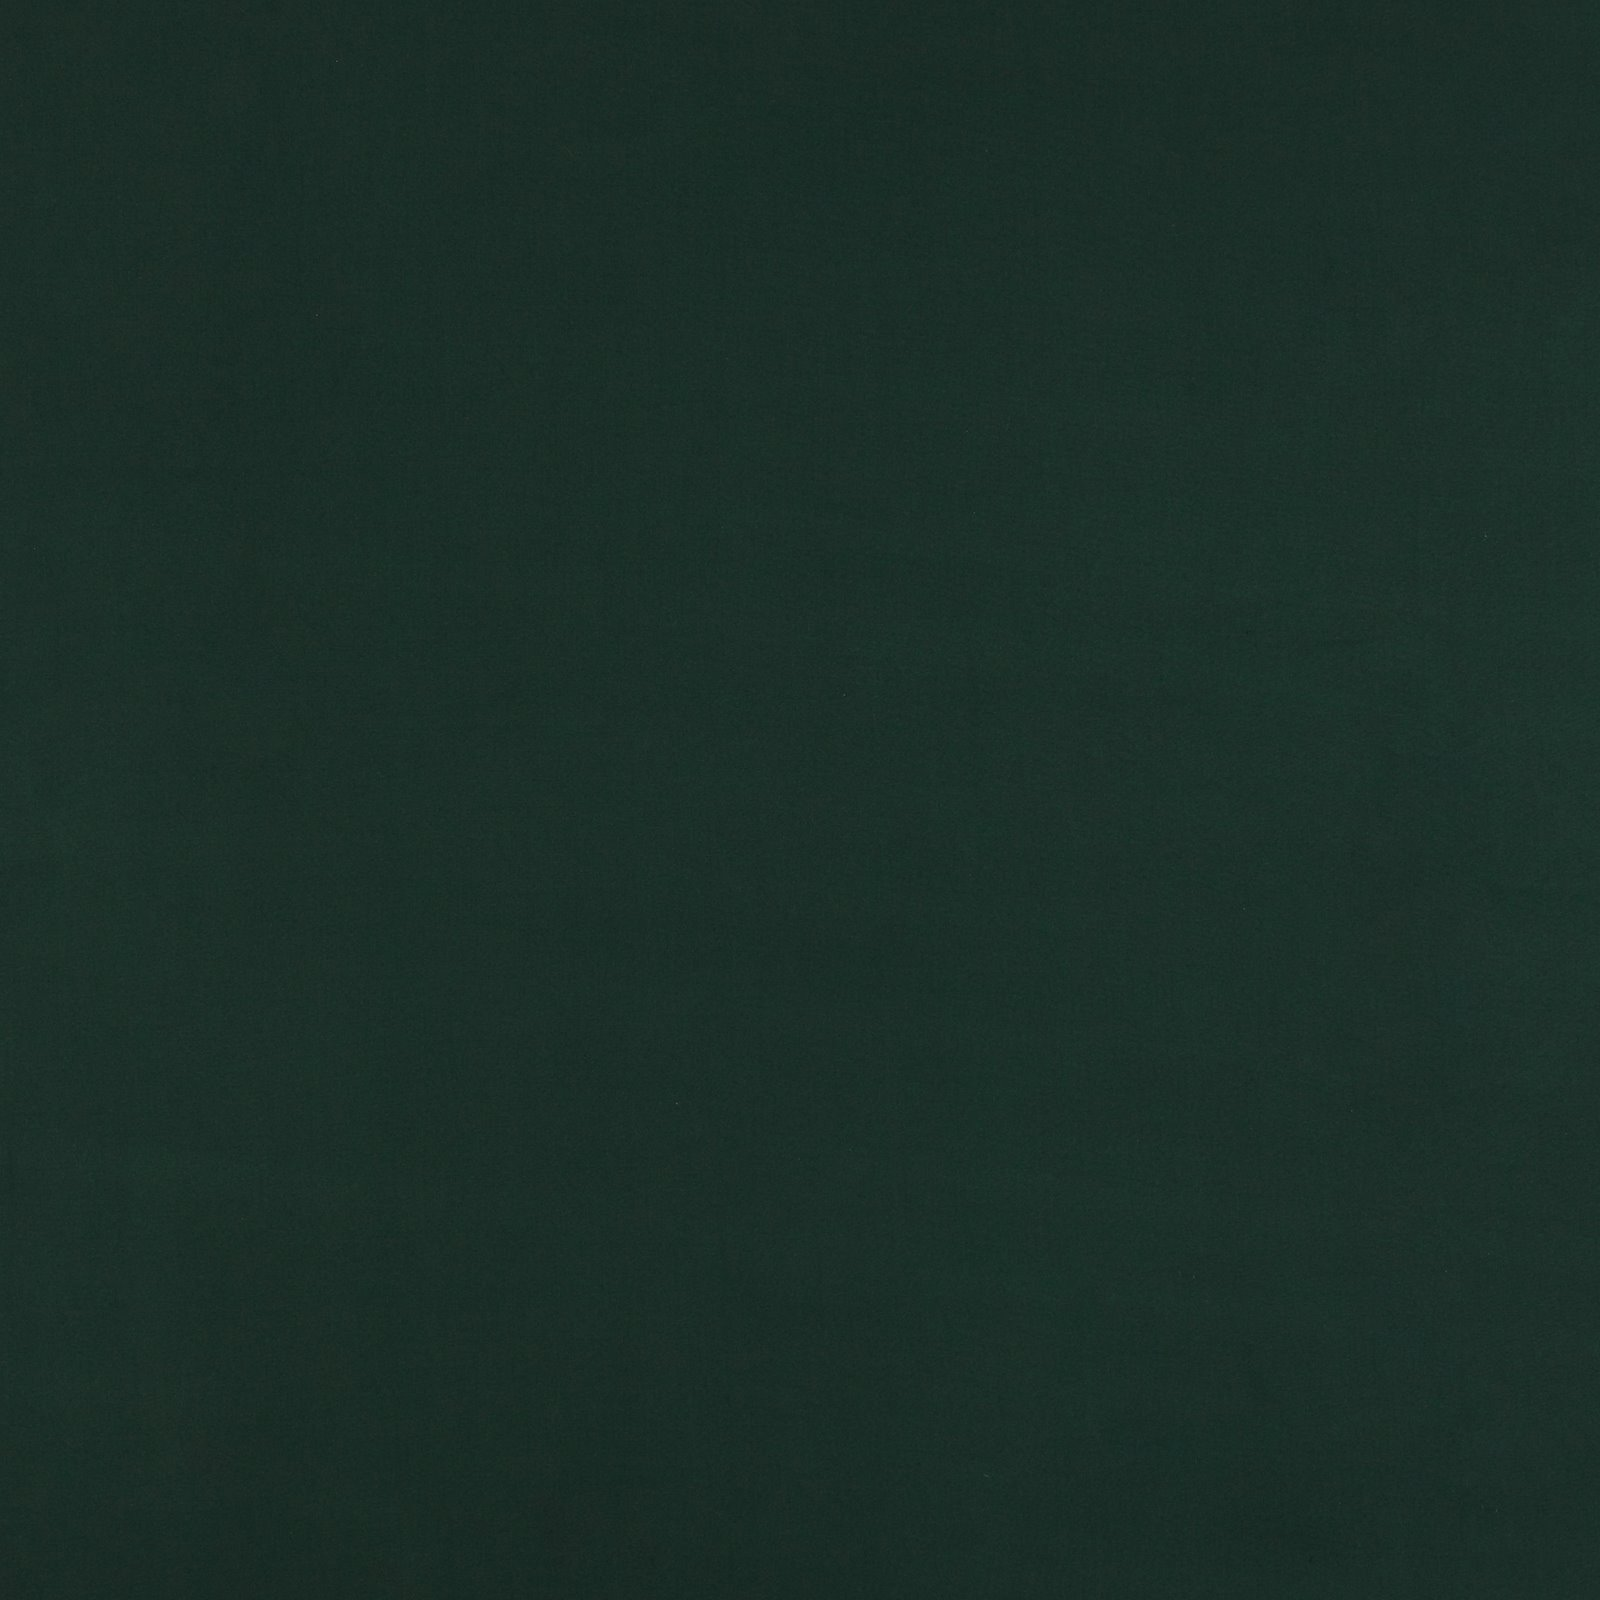 Woven viscose dark bottle green 710505_pack_solid